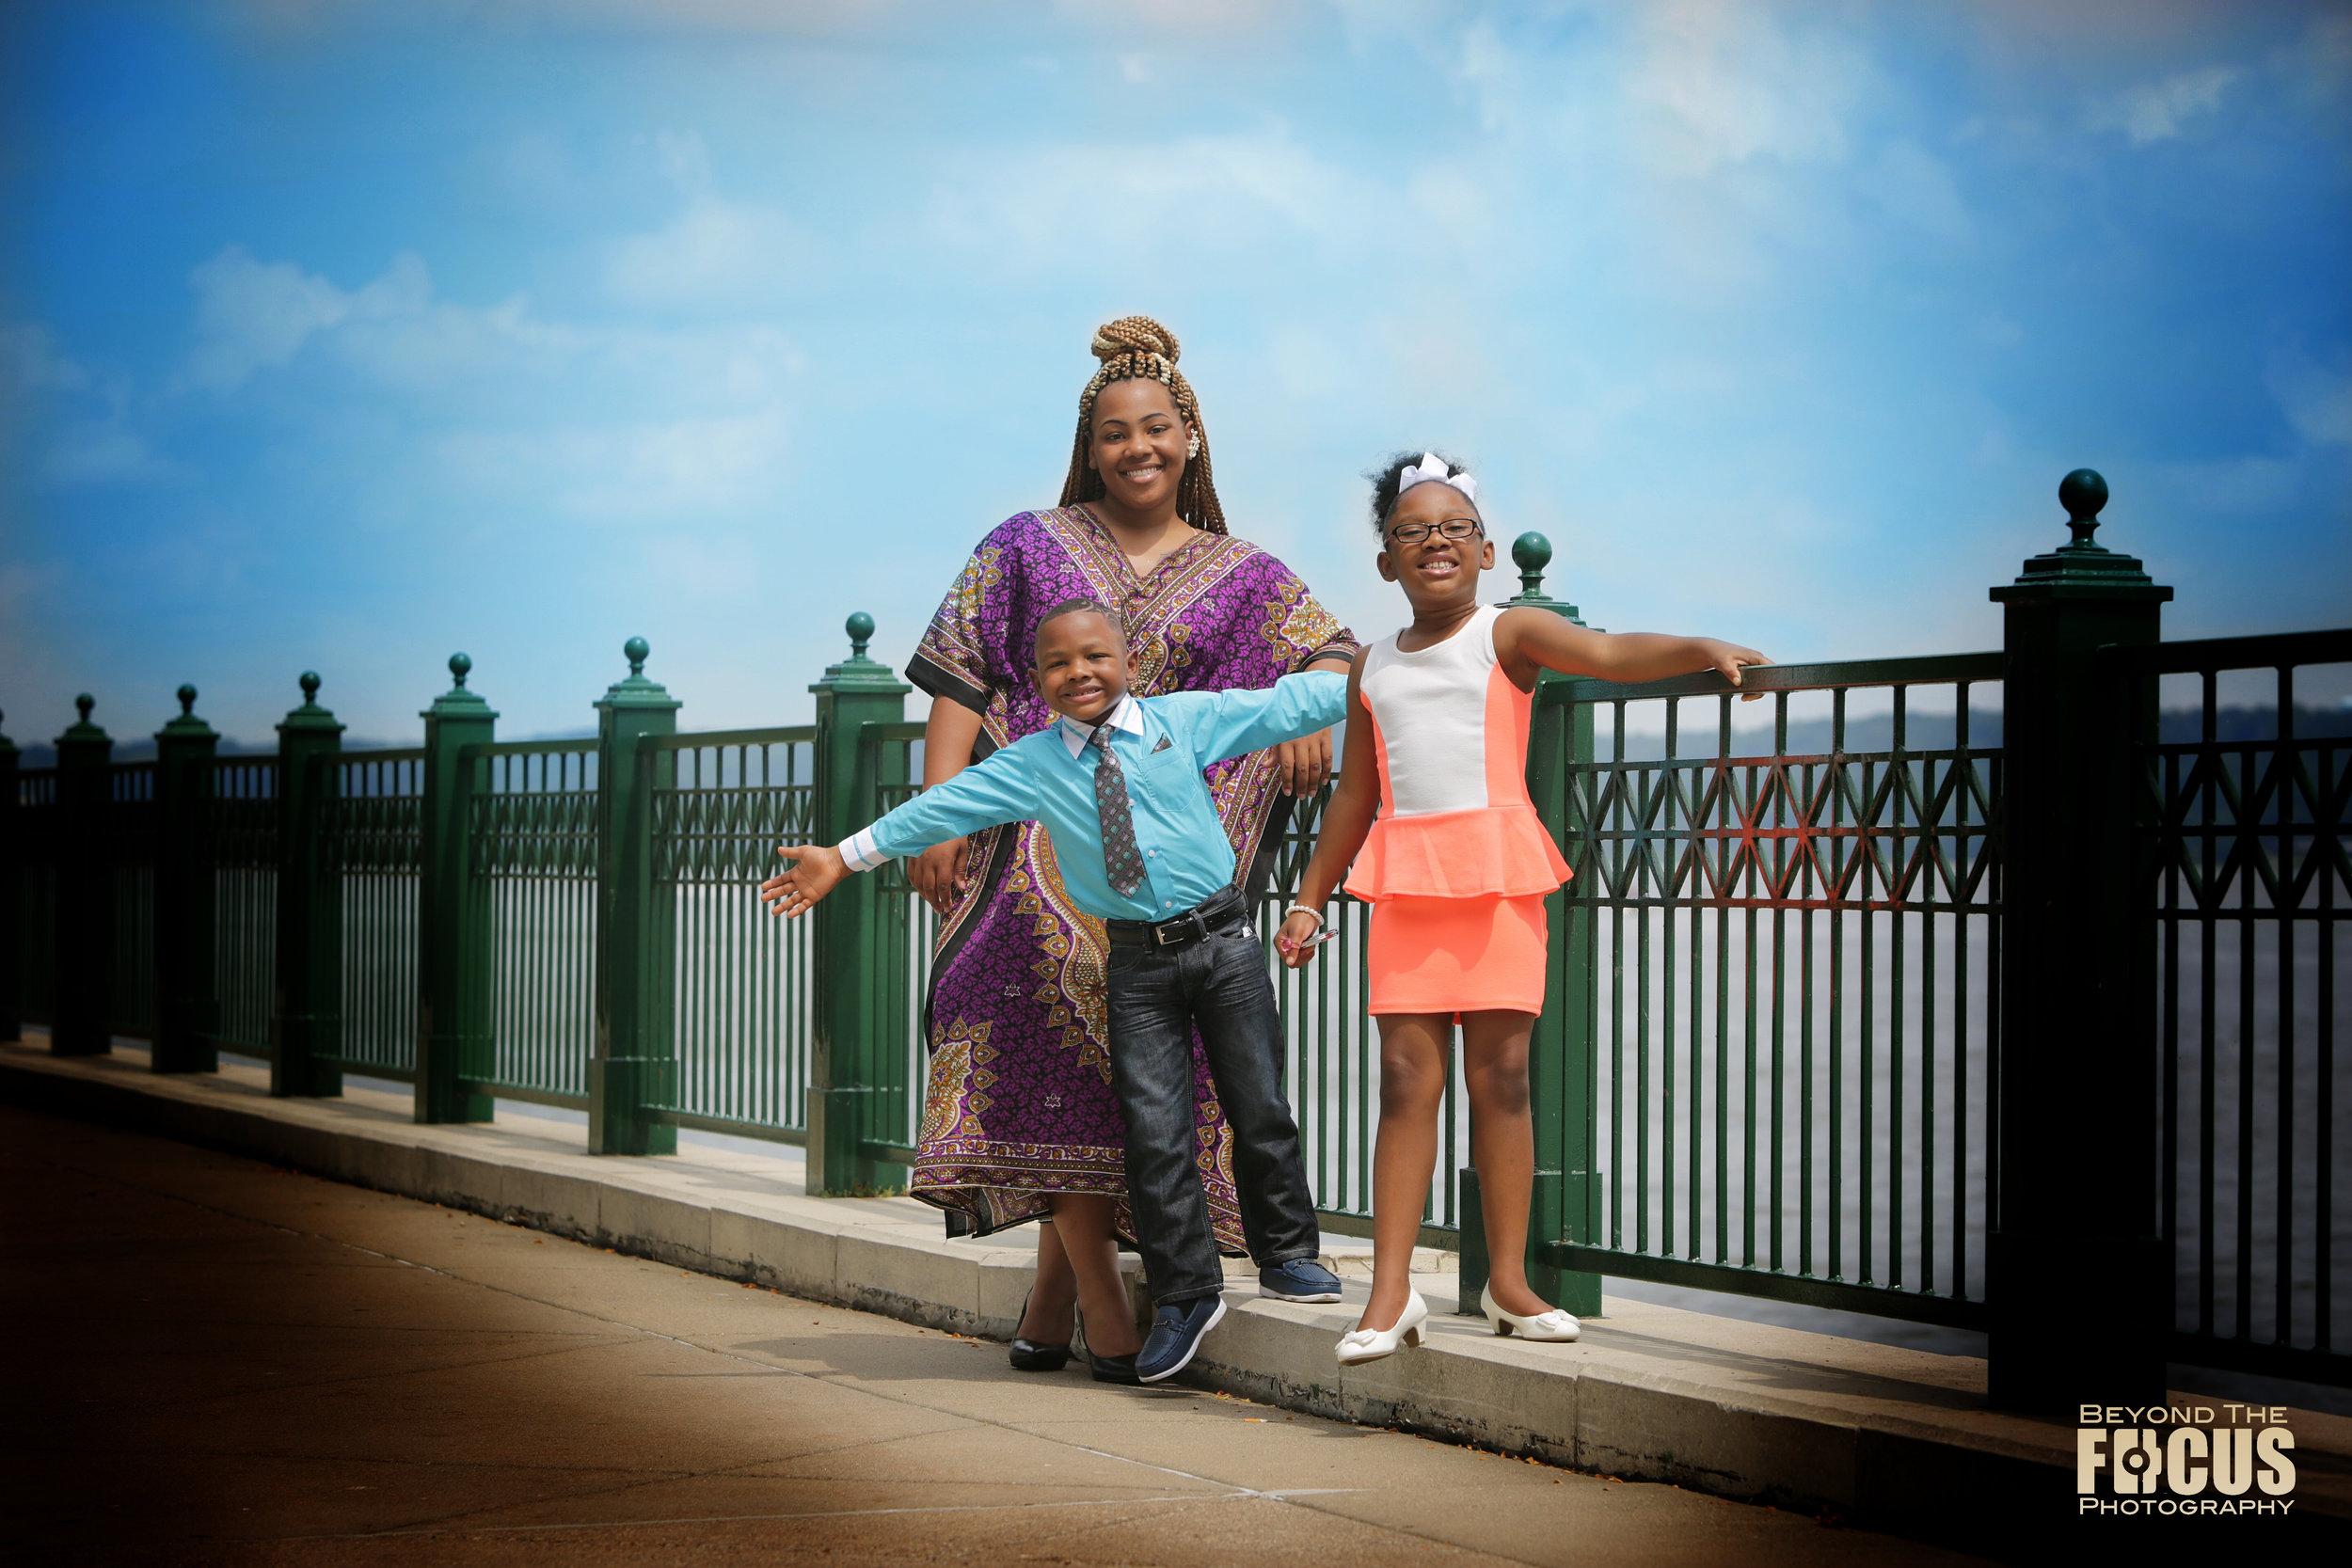 BeyondTheFocus Photography _ Family Photo 001